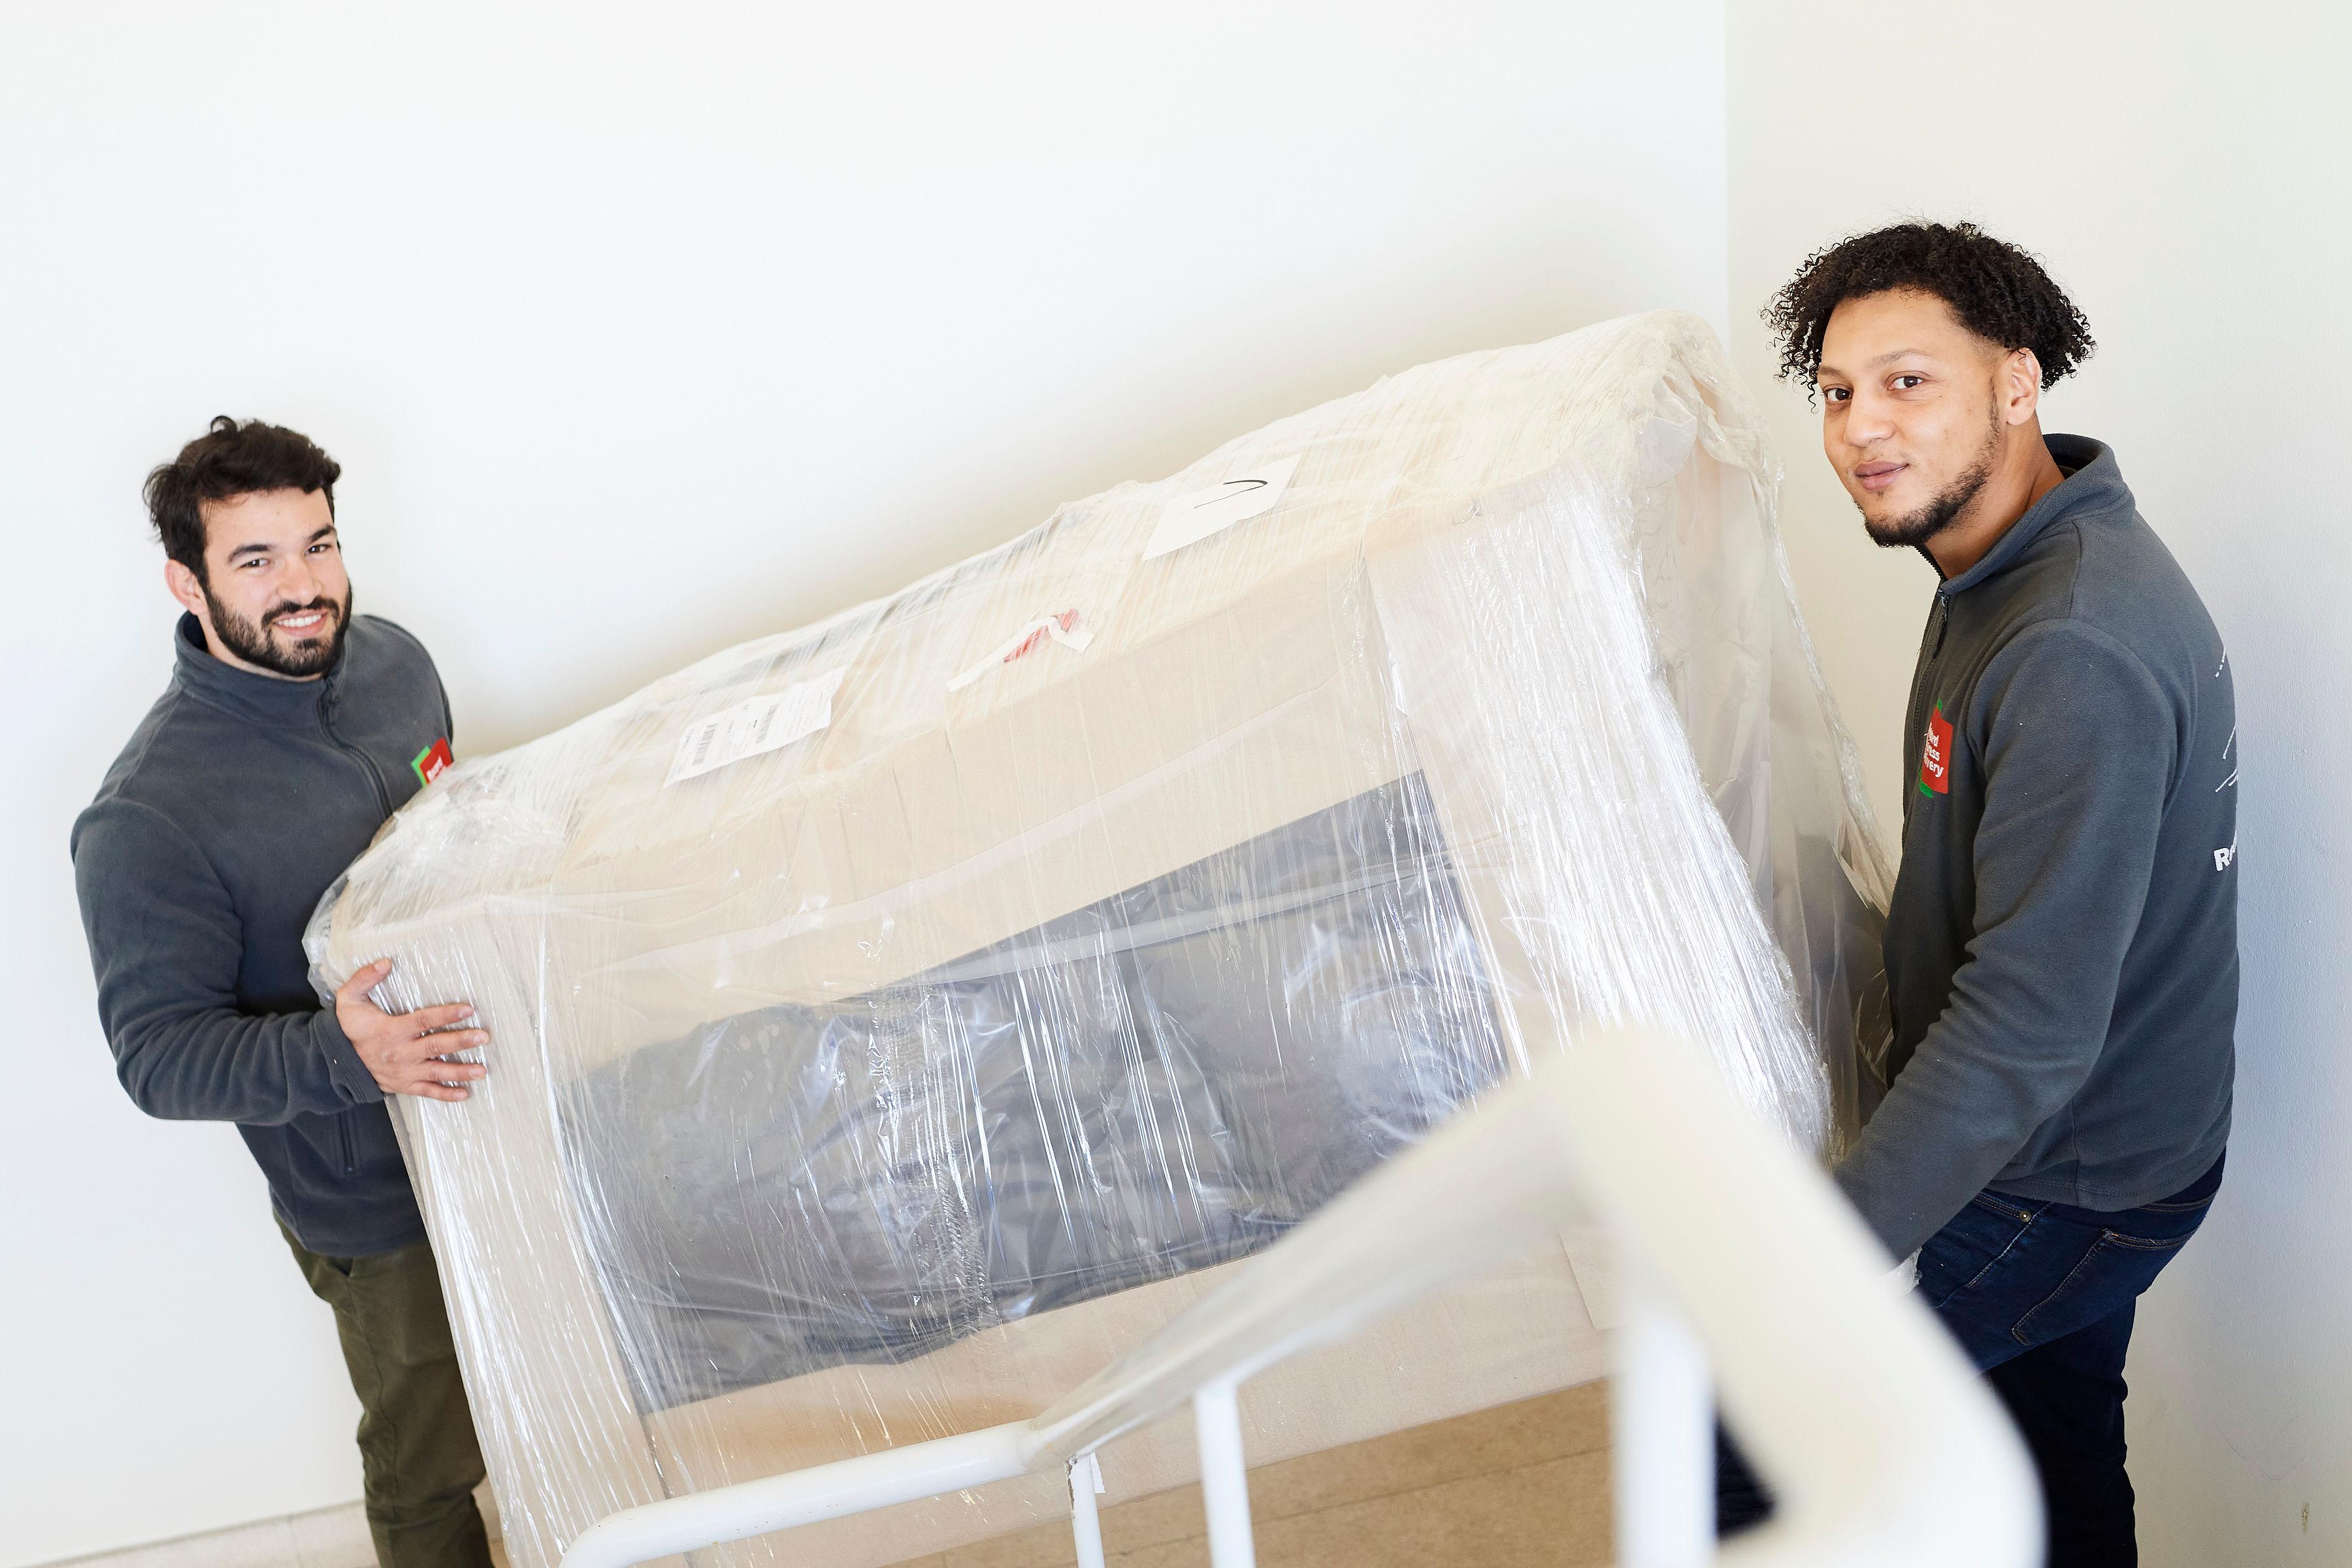 Thuisbezorging van grote pakketten